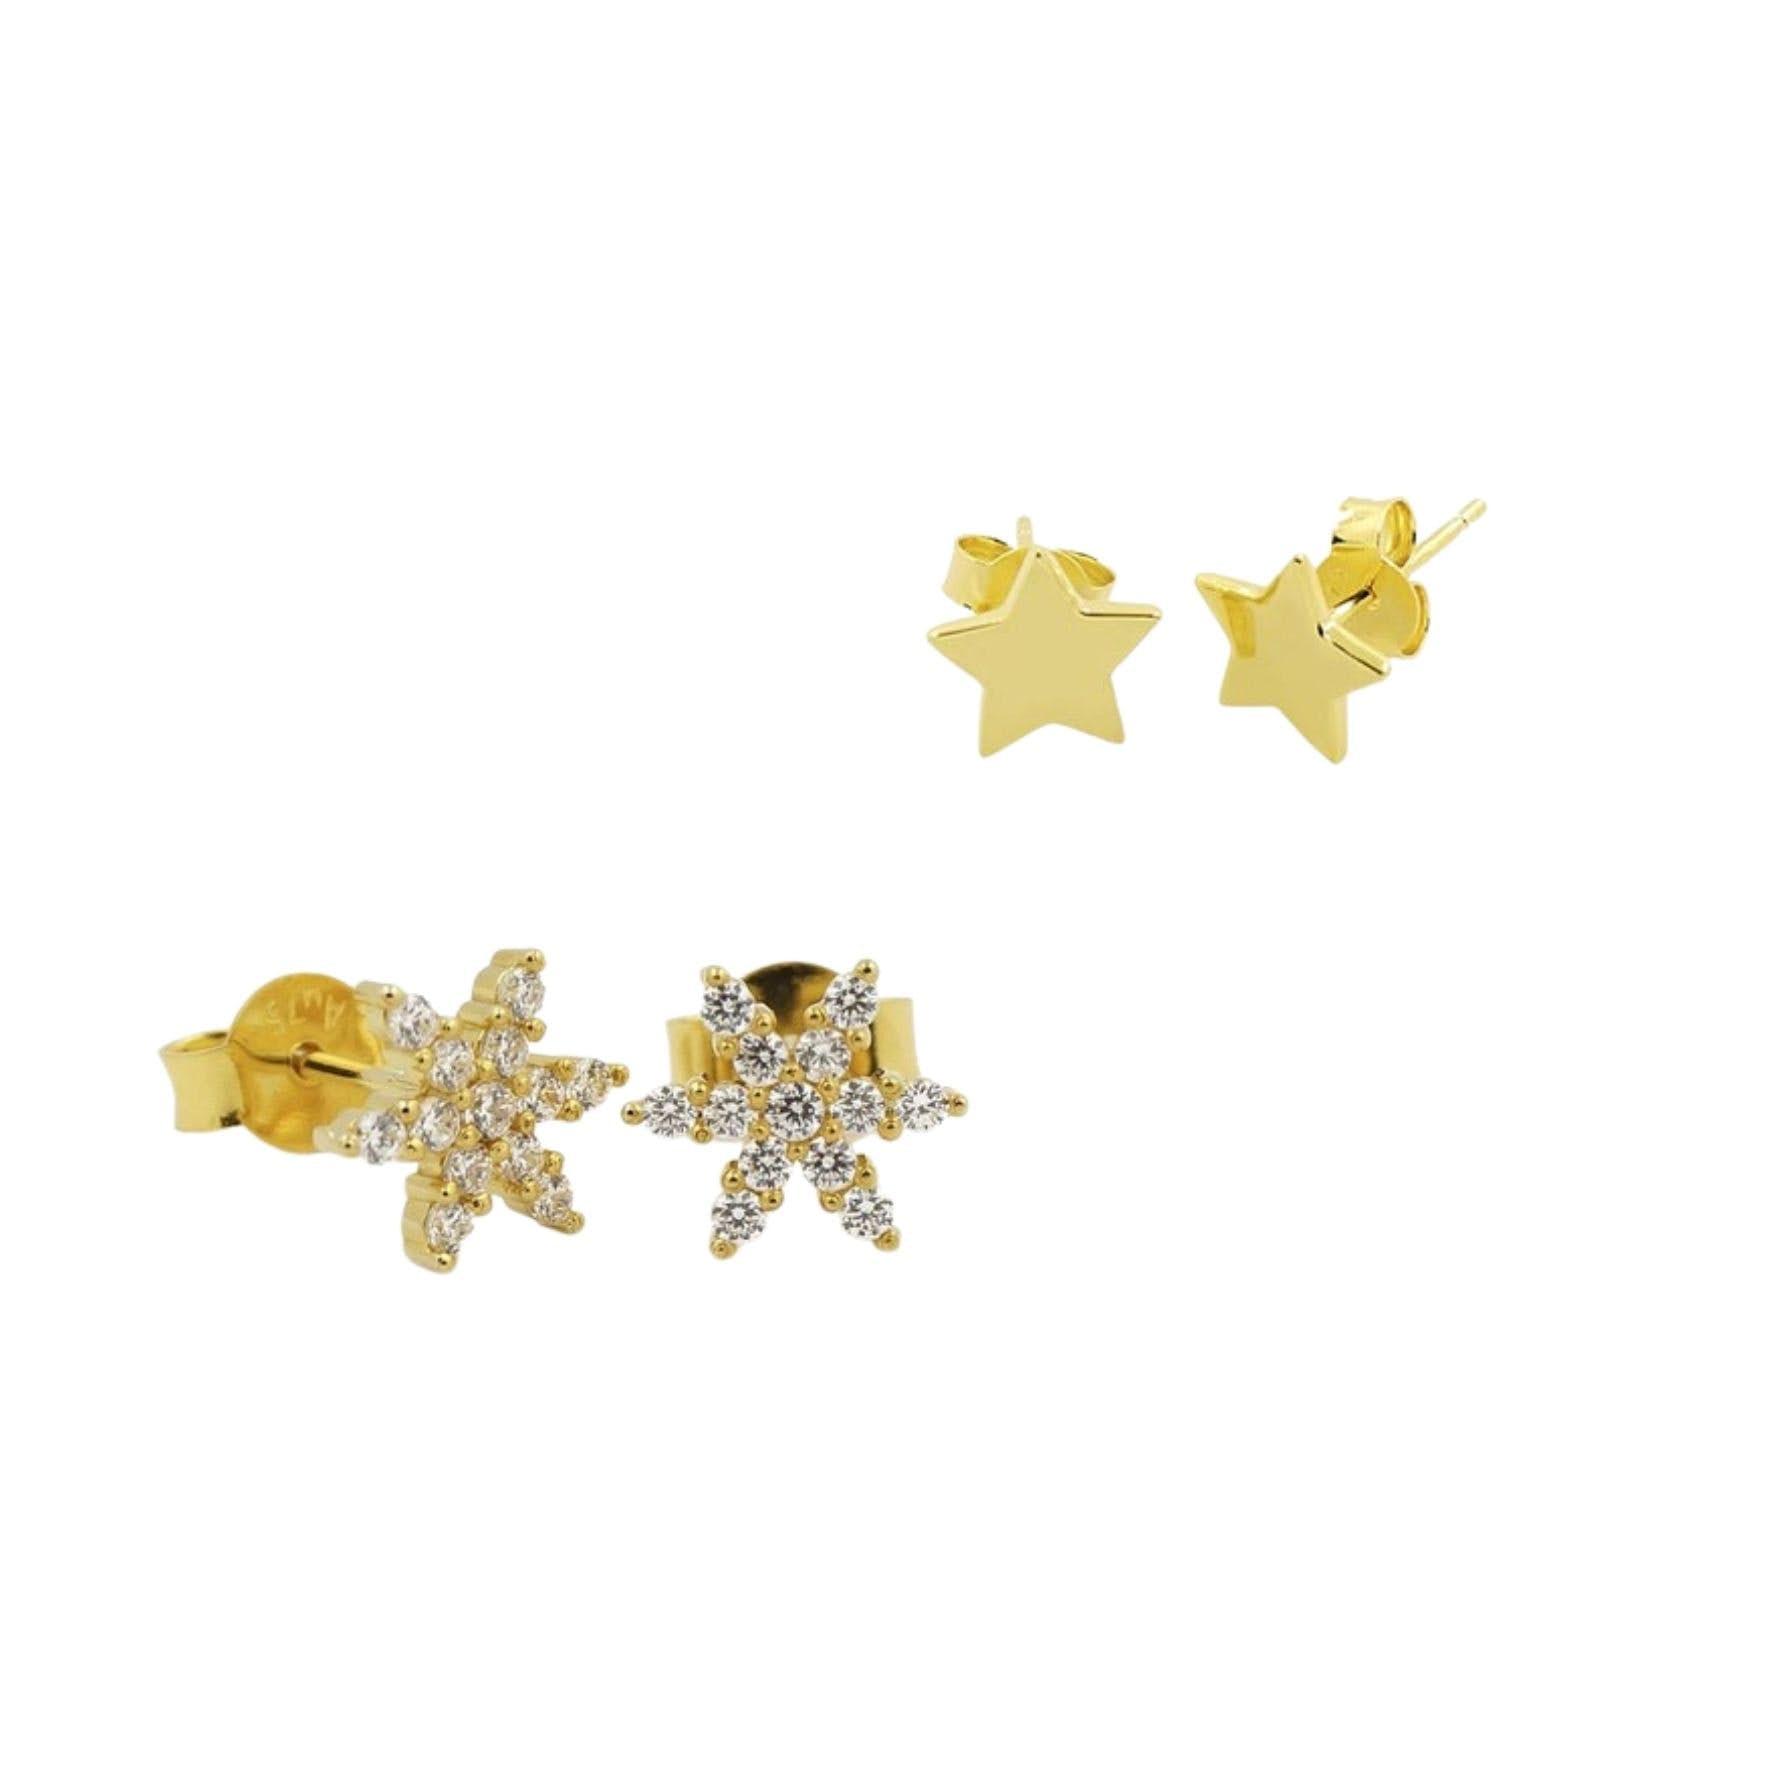 Jewelry mix: Stars